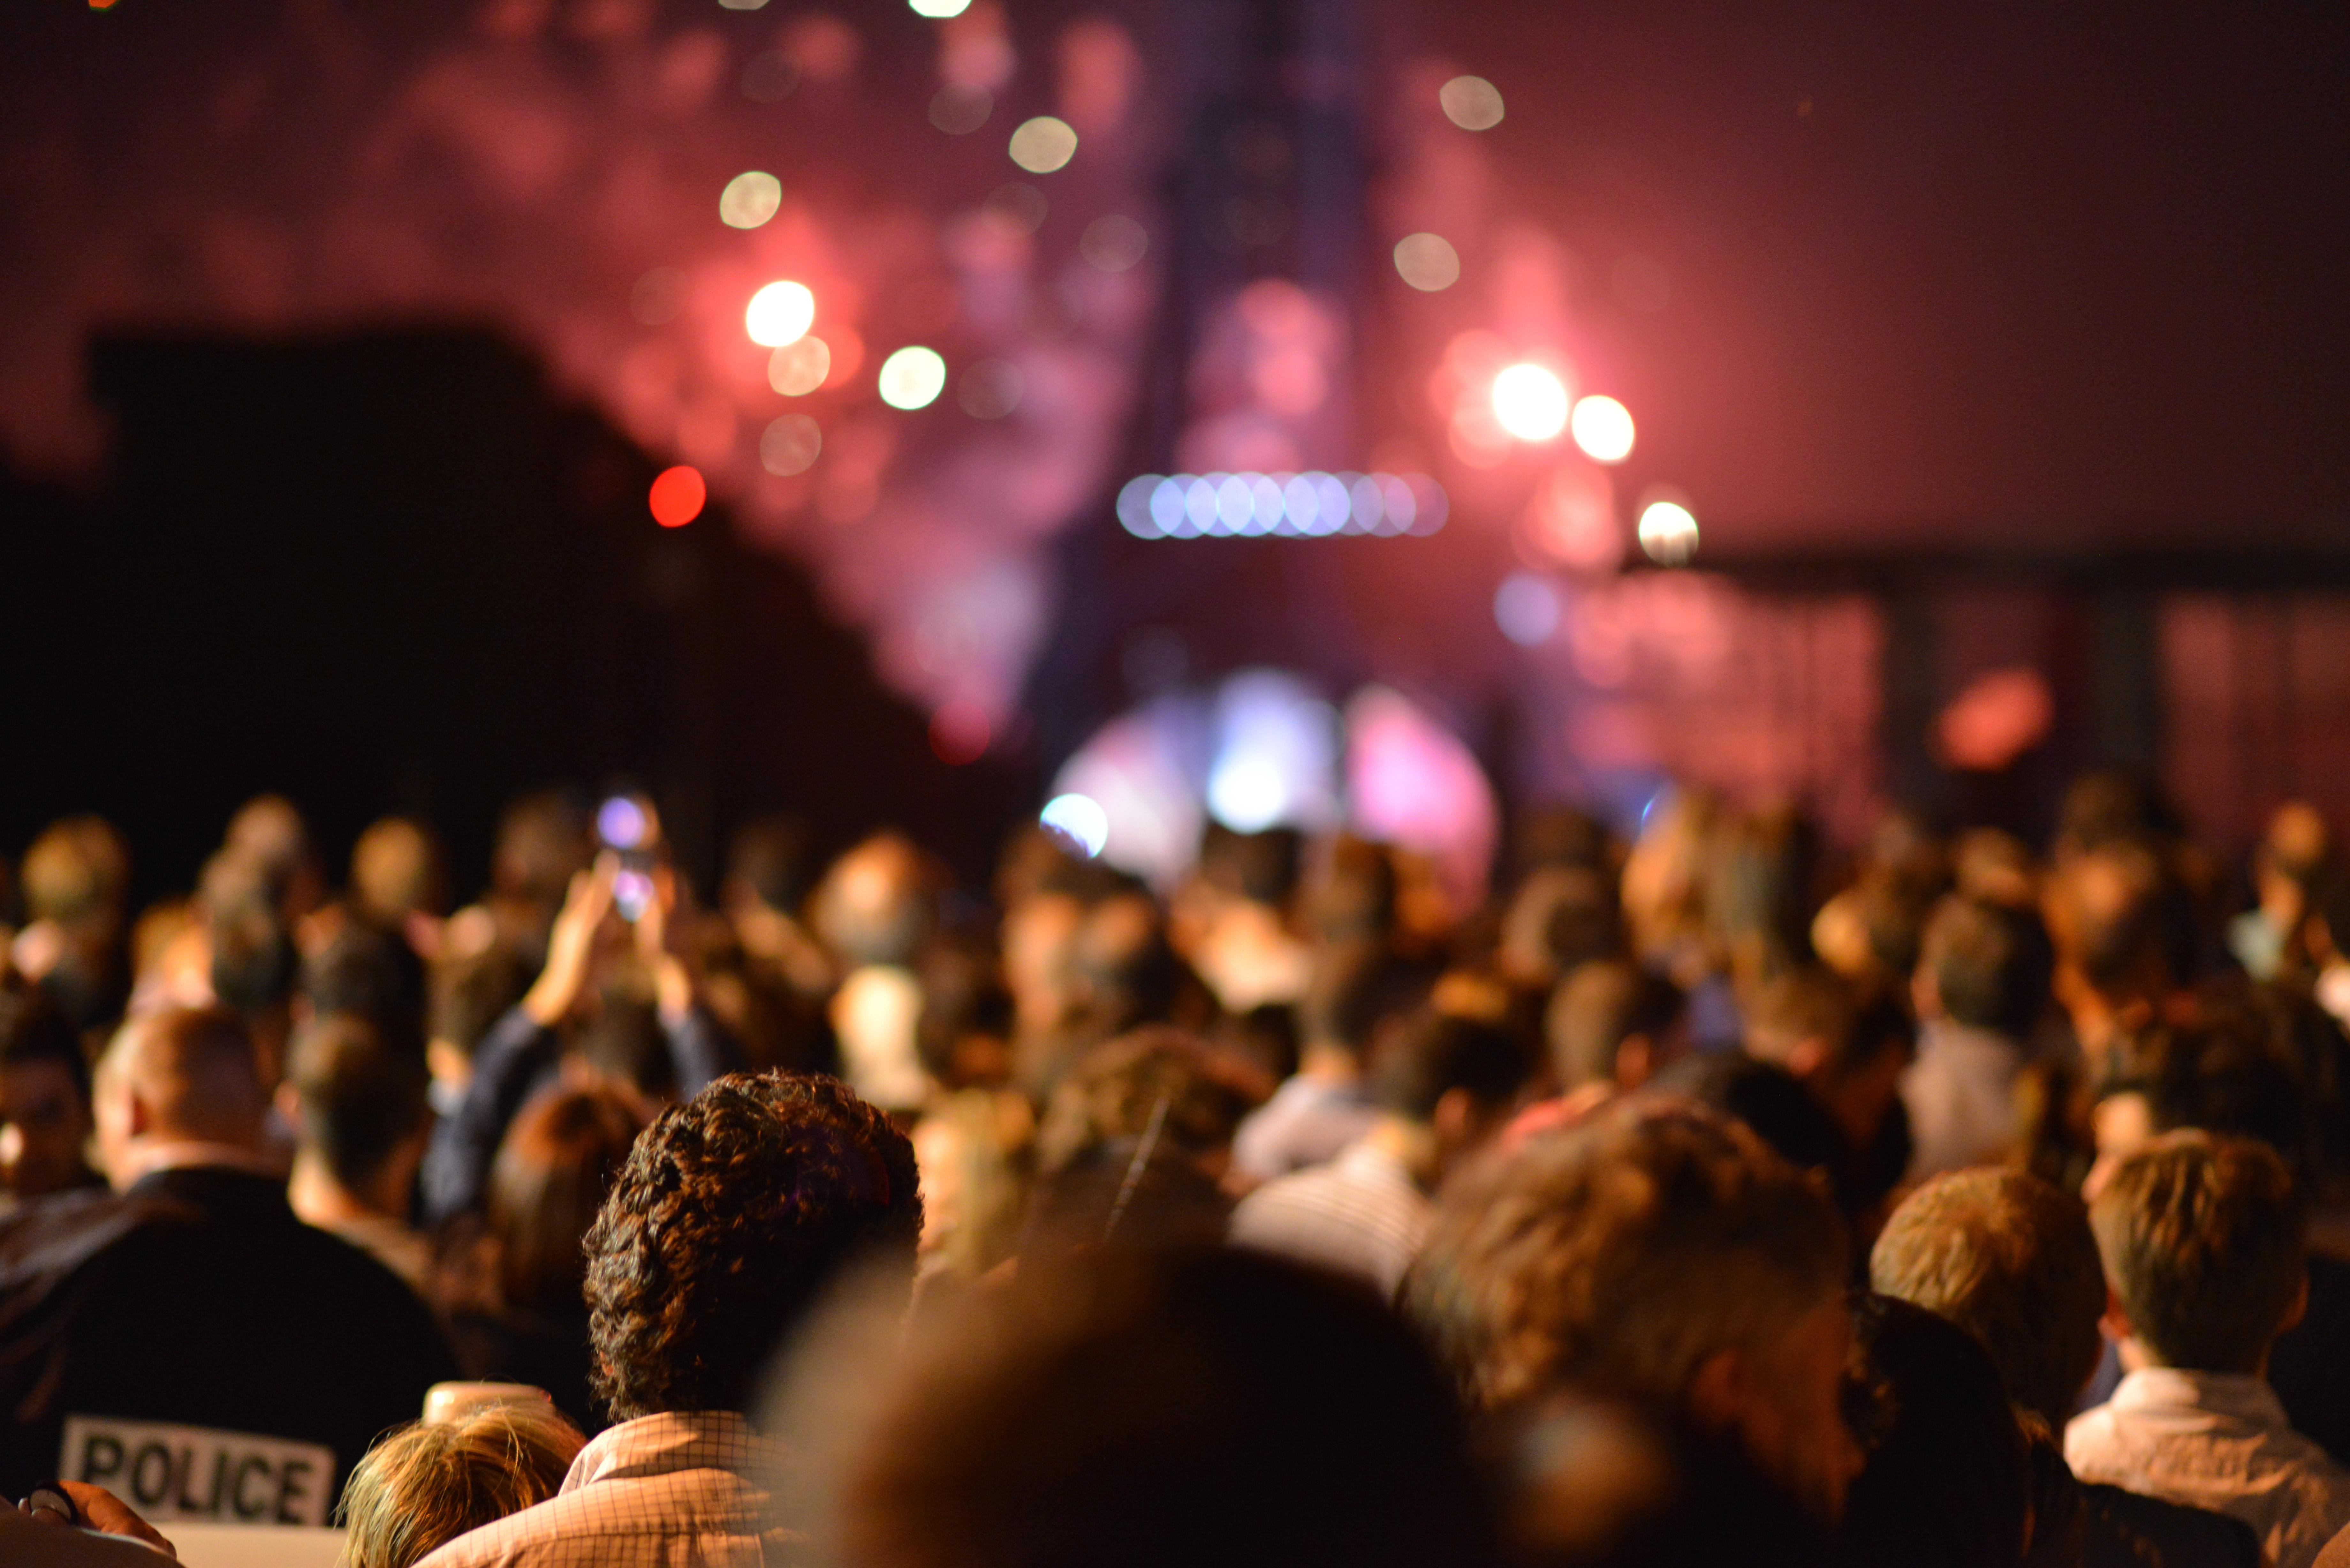 https://s3.us-east-2.amazonaws.com/withjamesbarr/genres/crowd-eiffel-fireworks.jpg